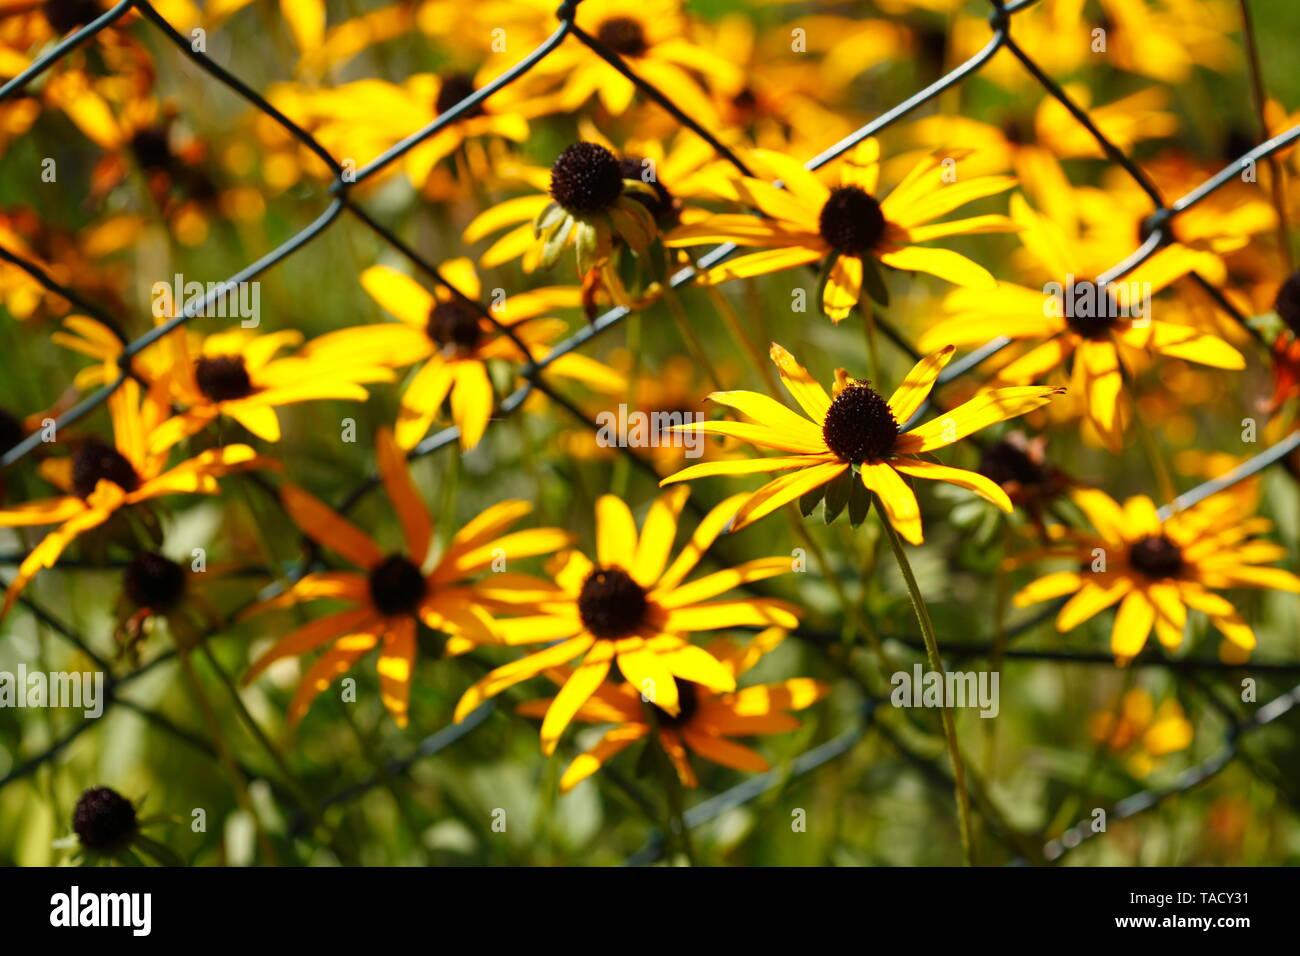 Blooming yellow sun hat (Rudbeckia fulgida), bloom, close-up, Germany, Europe - Stock Image